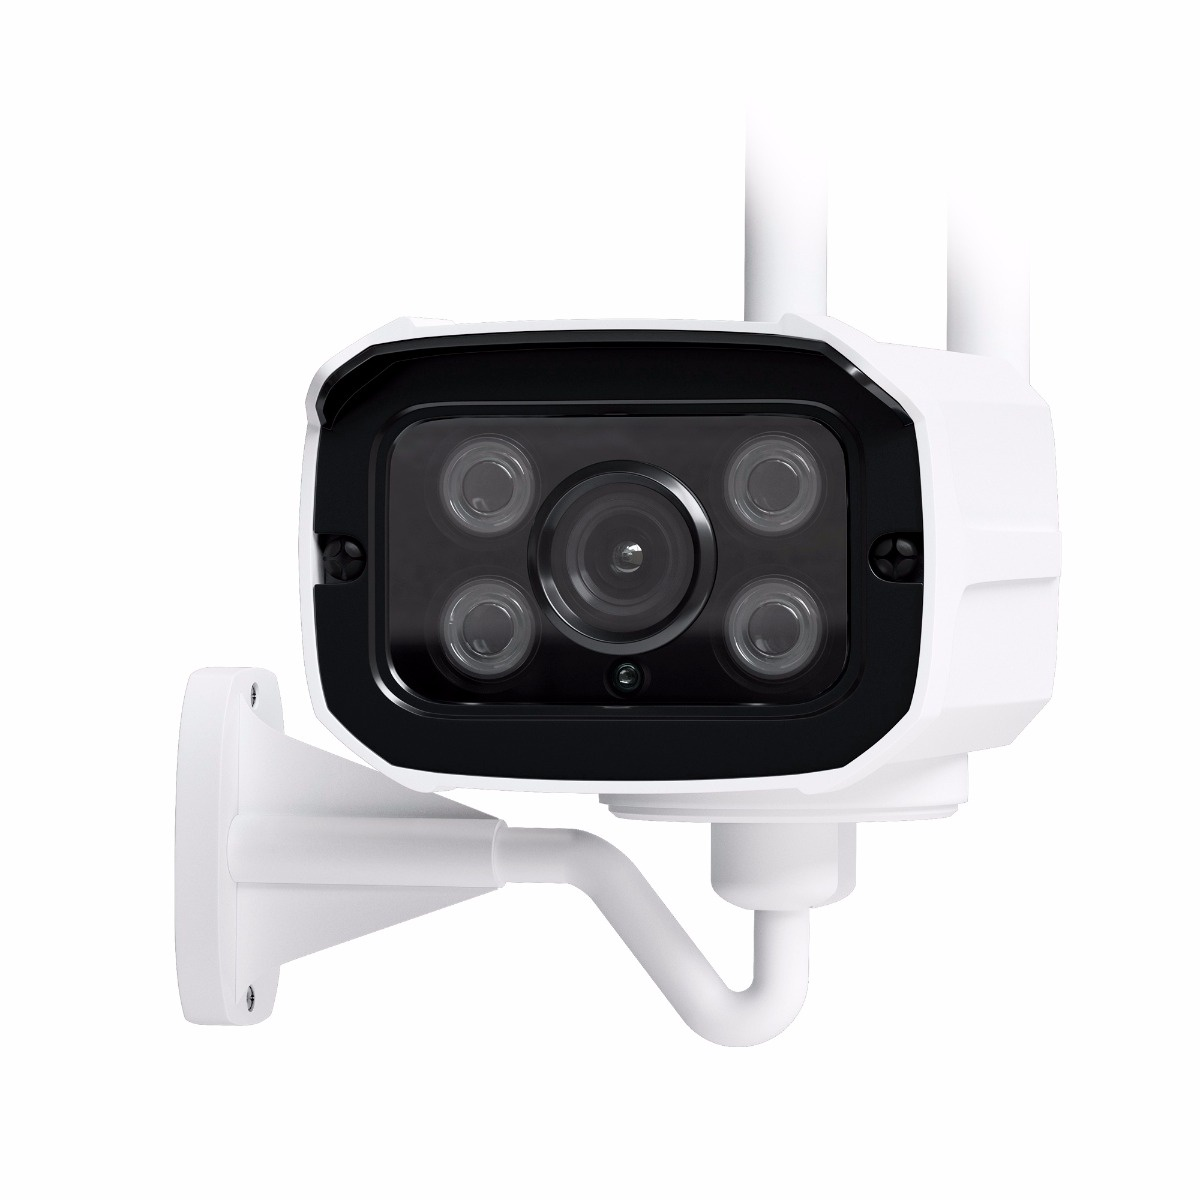 Фото - Камера видеонаблюдения Rubetek Уличная IP Камера Видеонаблюдения-Онлайн Мини WiFi Камера для Дома-Система сигнализации для Дачи видео